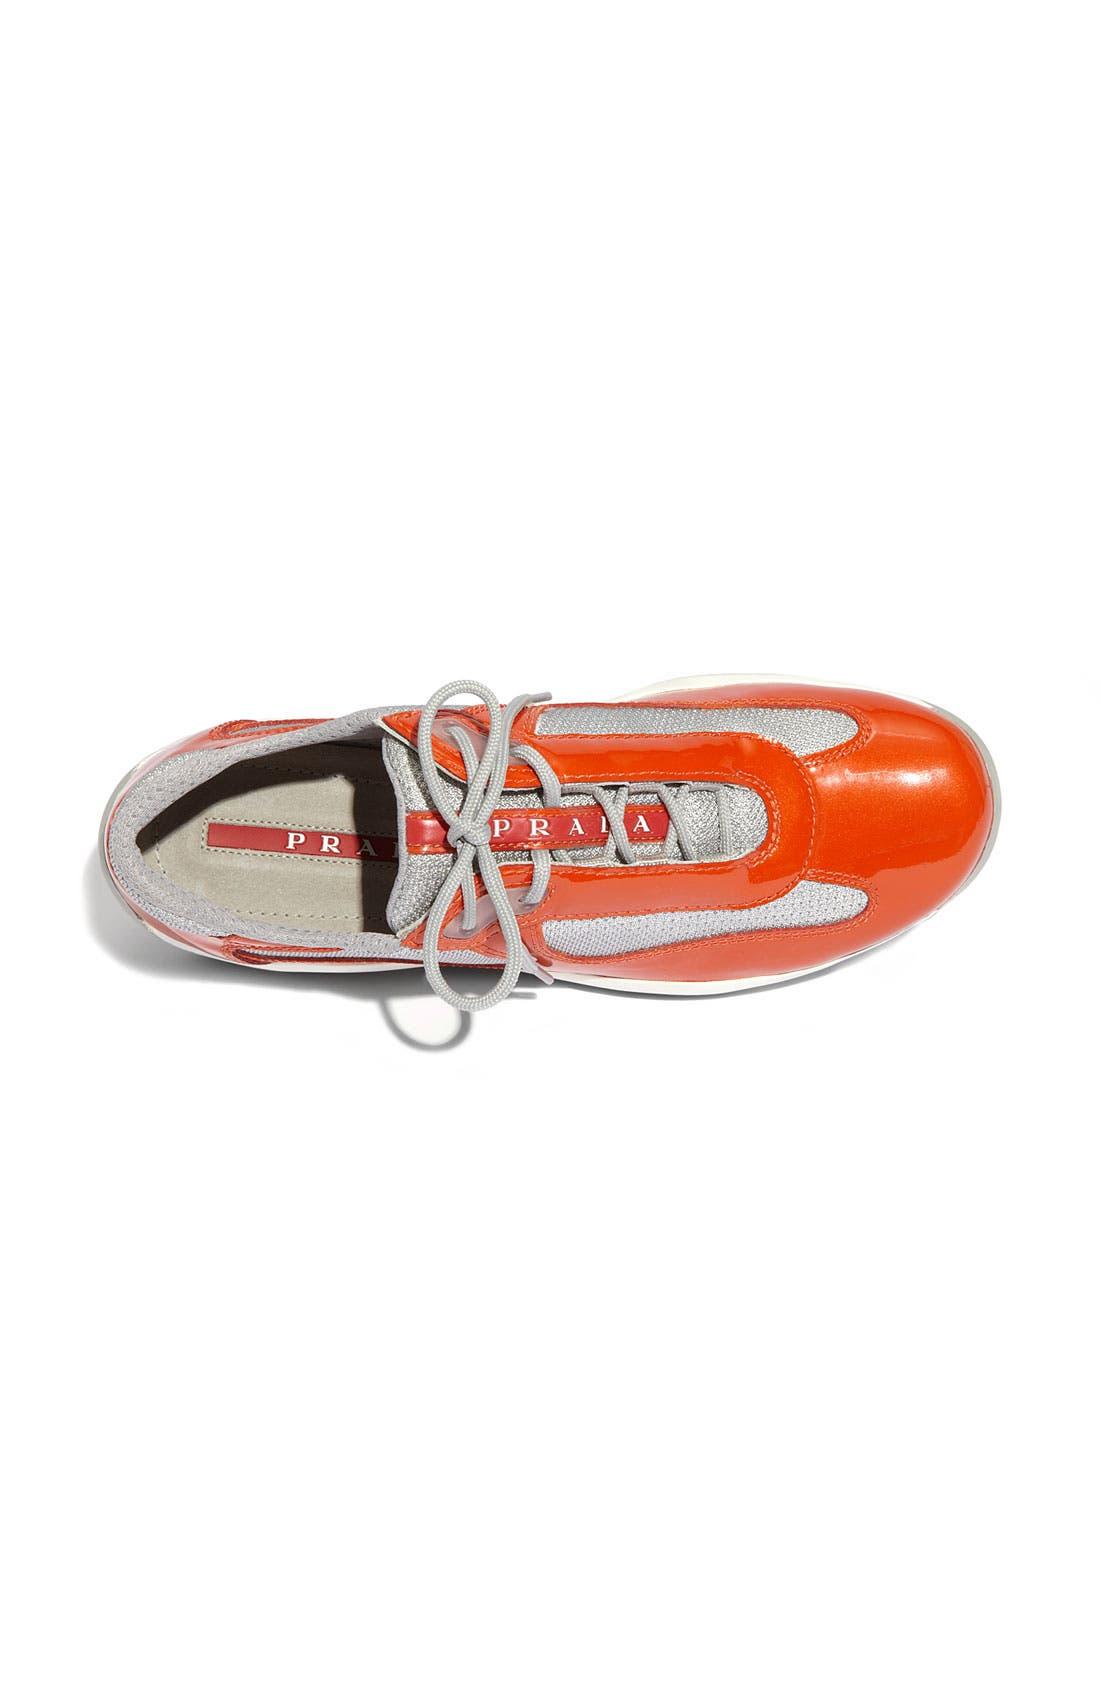 Alternate Image 3  - Prada Patent Leather & Mesh Sneaker